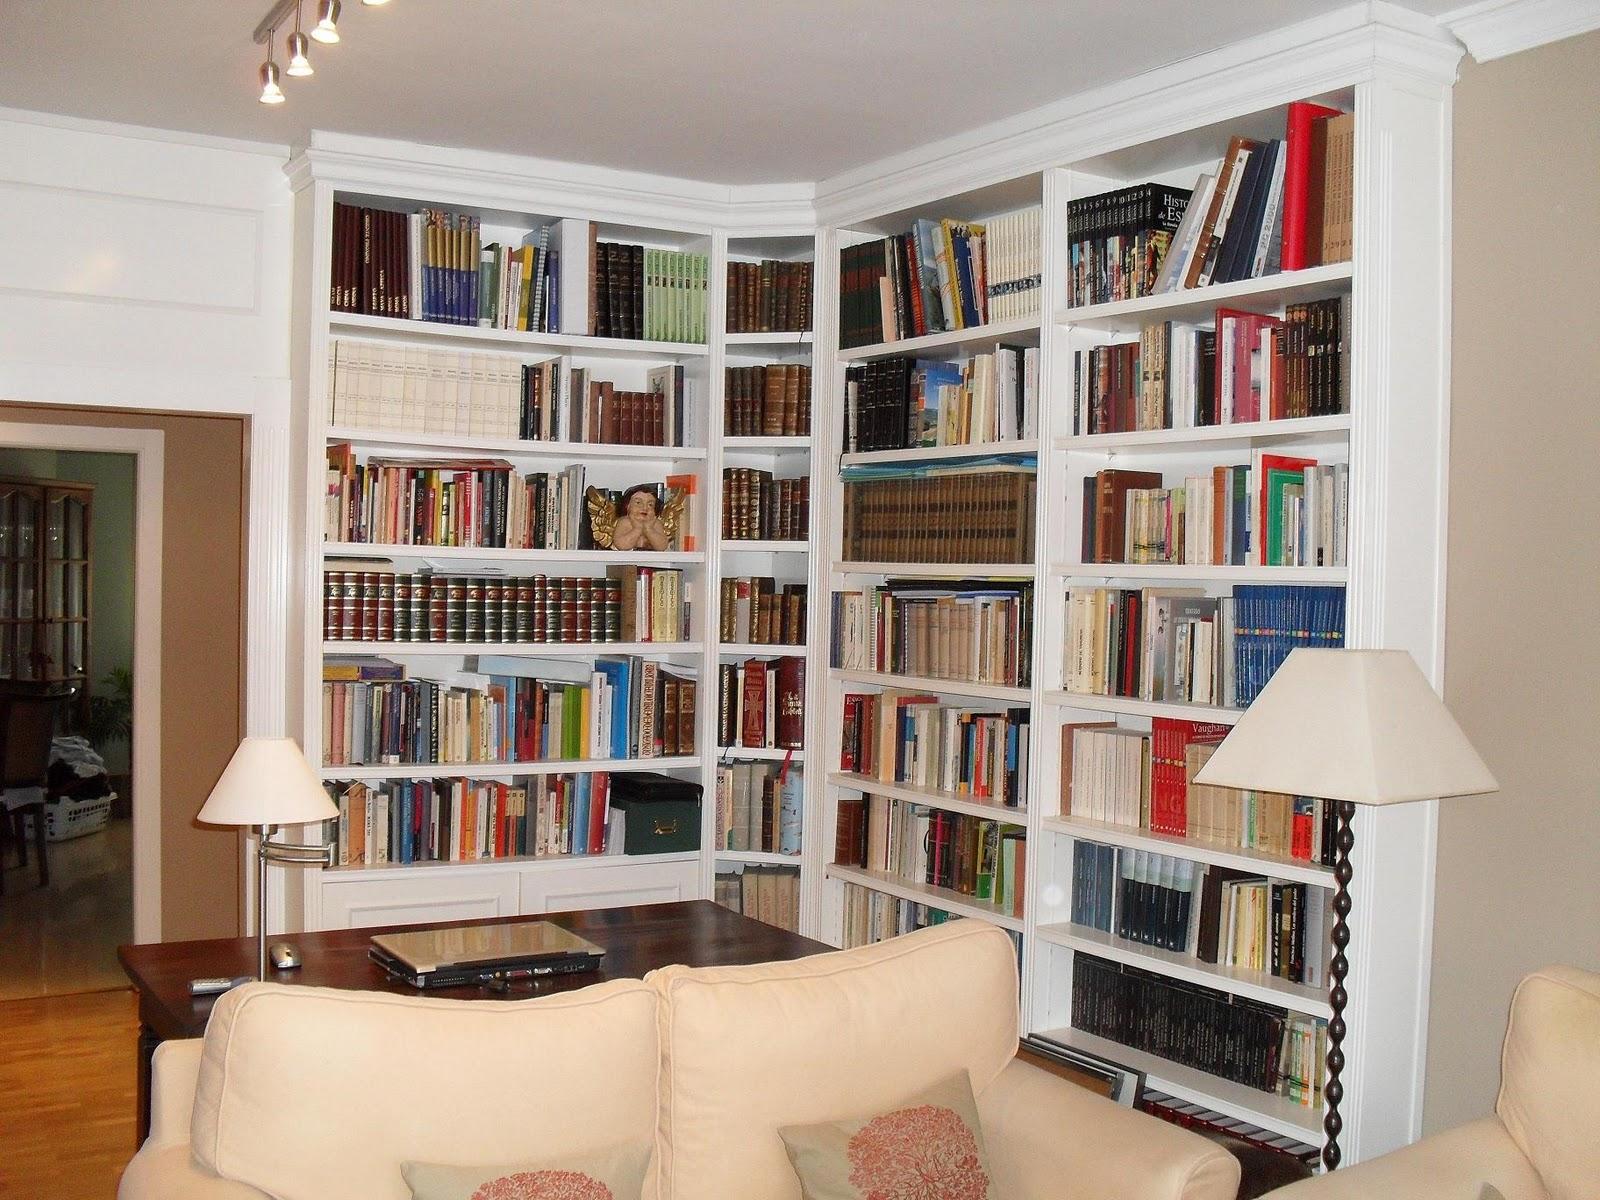 Libreria a medida madrid mueble a medida 617075183 for Mueble libreria ikea